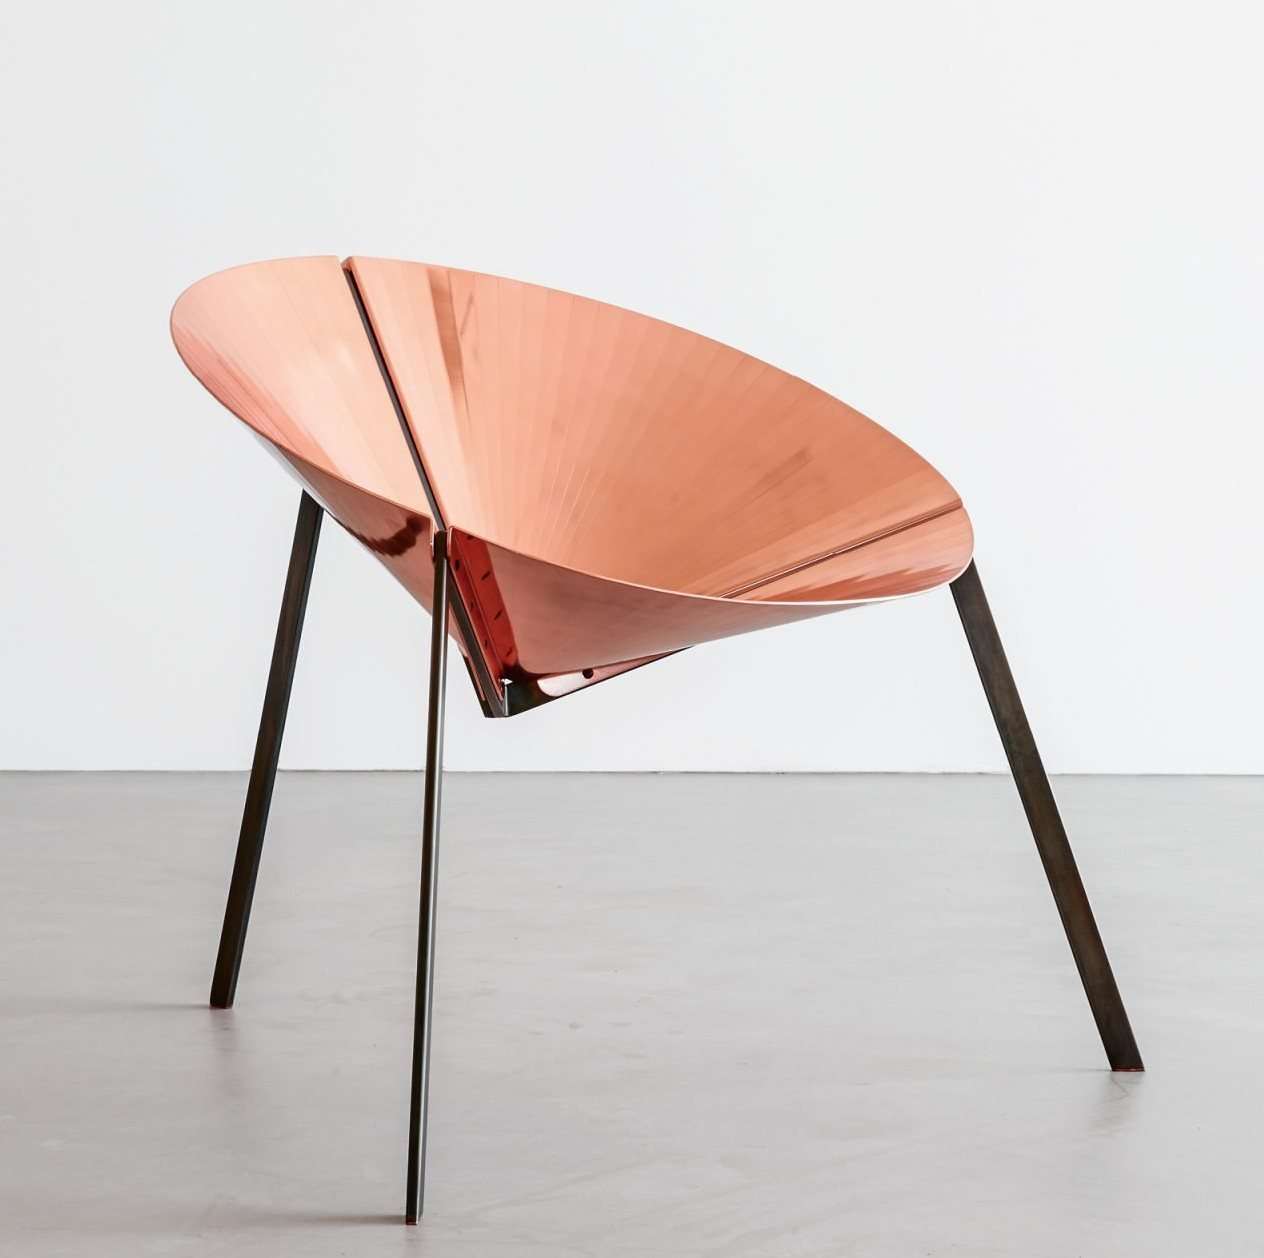 Pensado Ad Acapulco Chair lounge from De Castelli, designed by IV Design